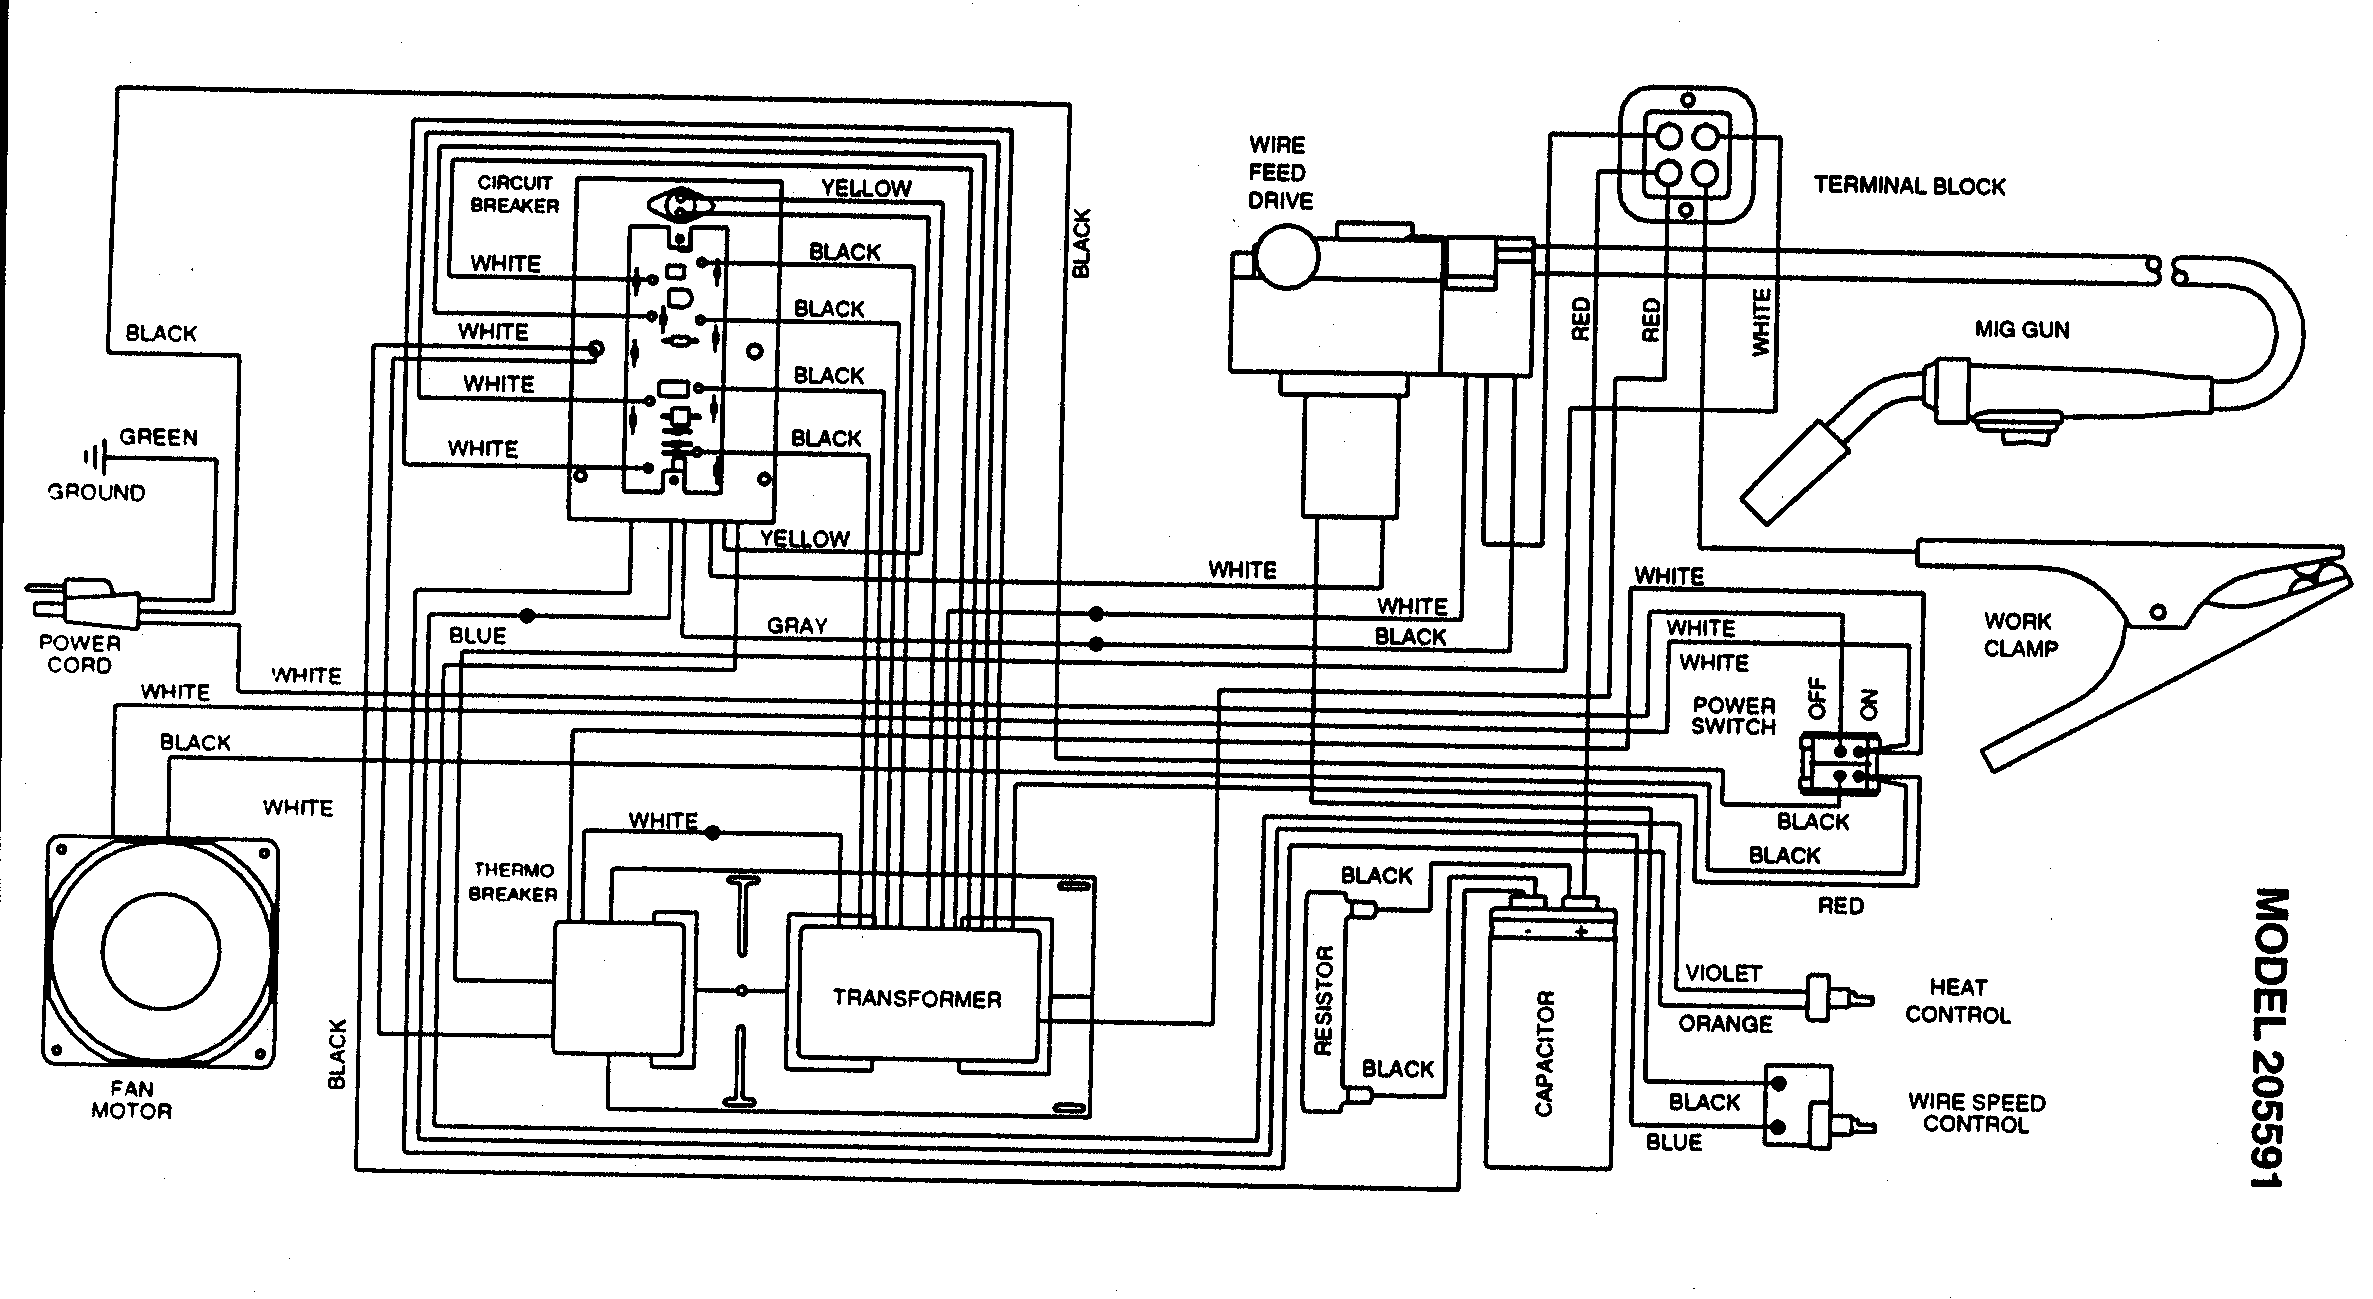 solar 2175 welder wiring diagrams sz 0143  wiring diagram diagram parts list for model 93420111  sz 0143  wiring diagram diagram parts